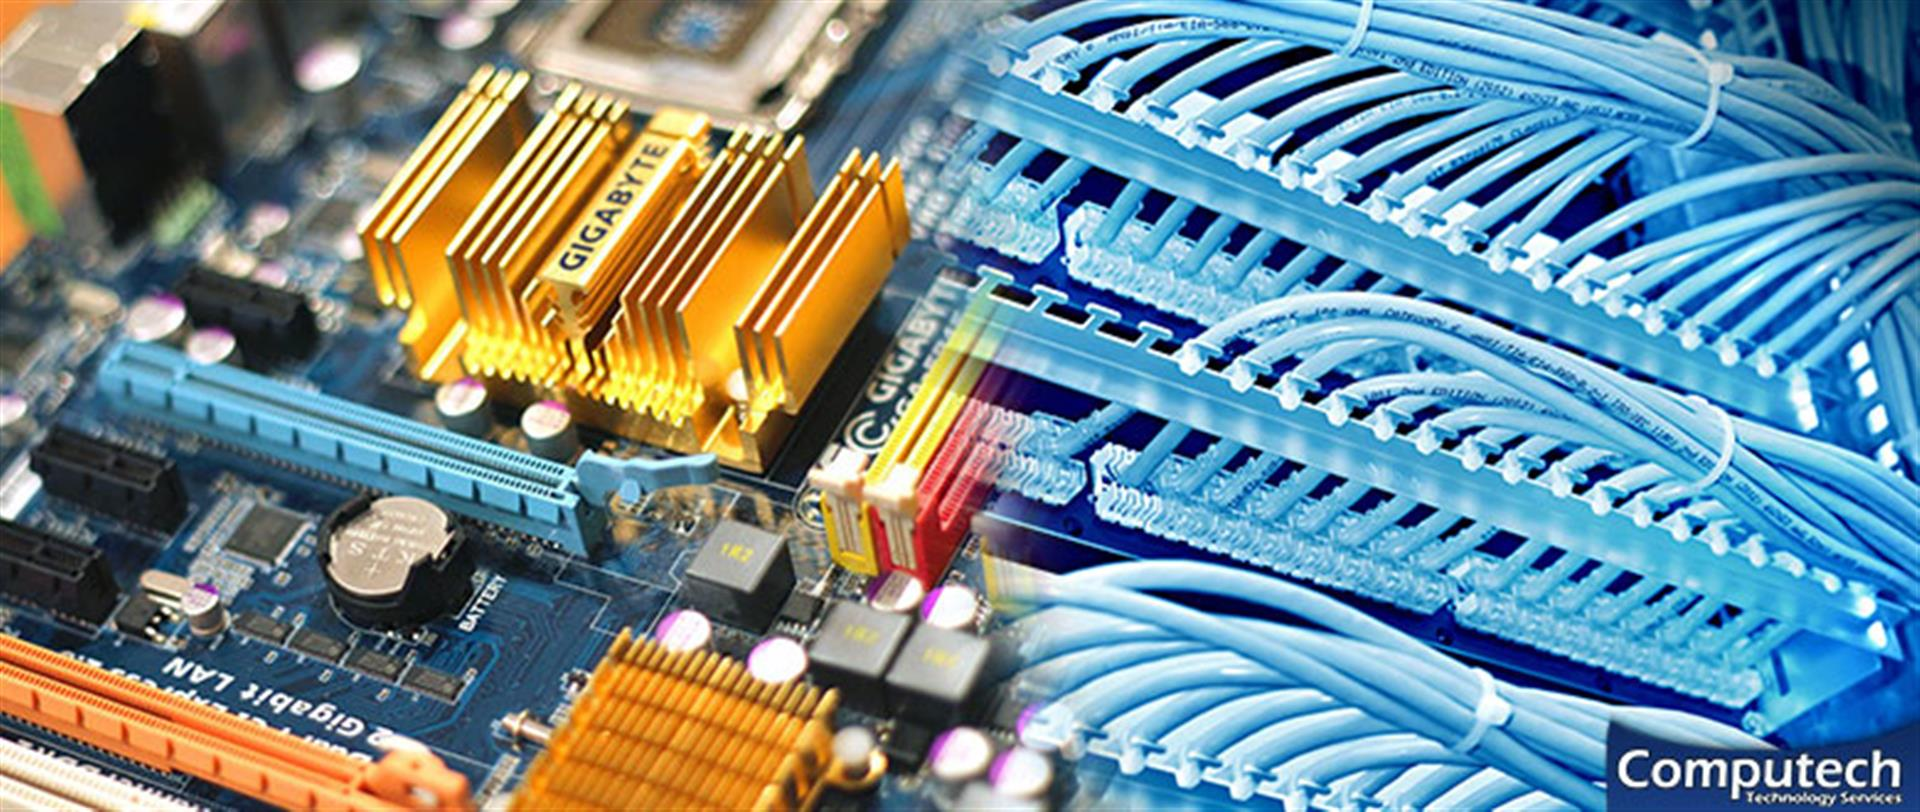 Villa Rica Georgia On Site Computer & Printer Repairs, Network, Voice & Data Cabling Solutions